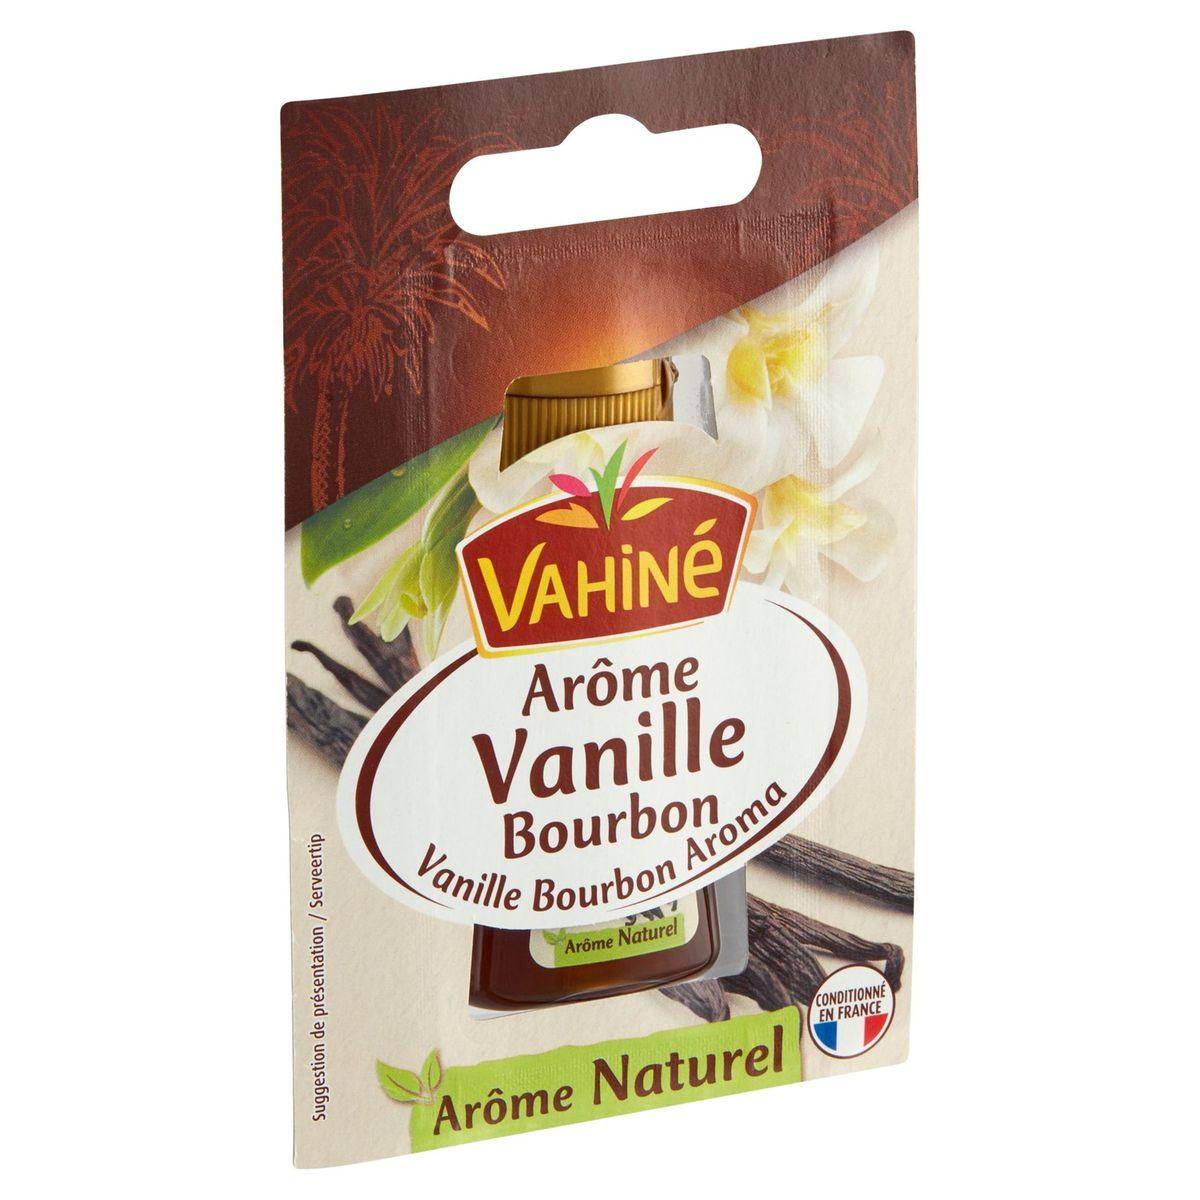 Vahiné Arôme Vanille Bourbon 20 ml